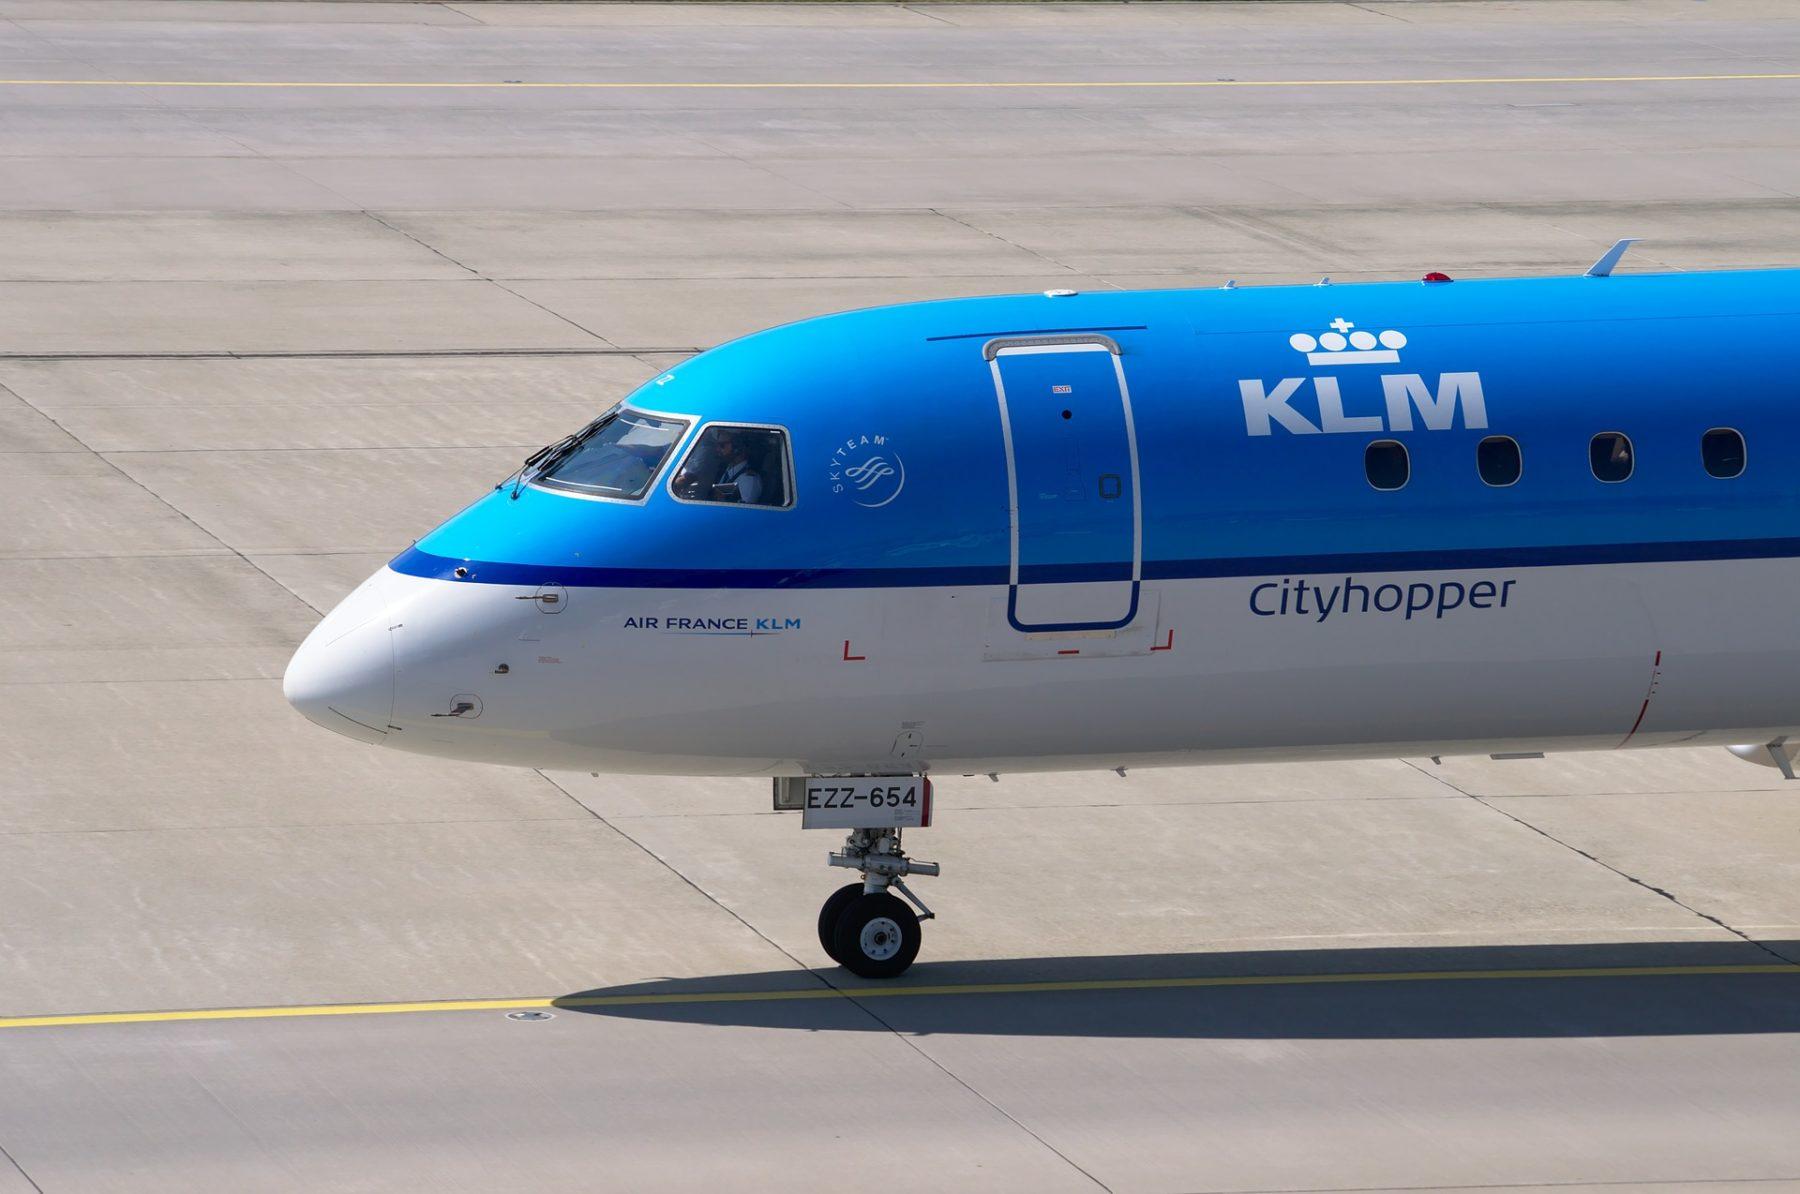 KLM vols